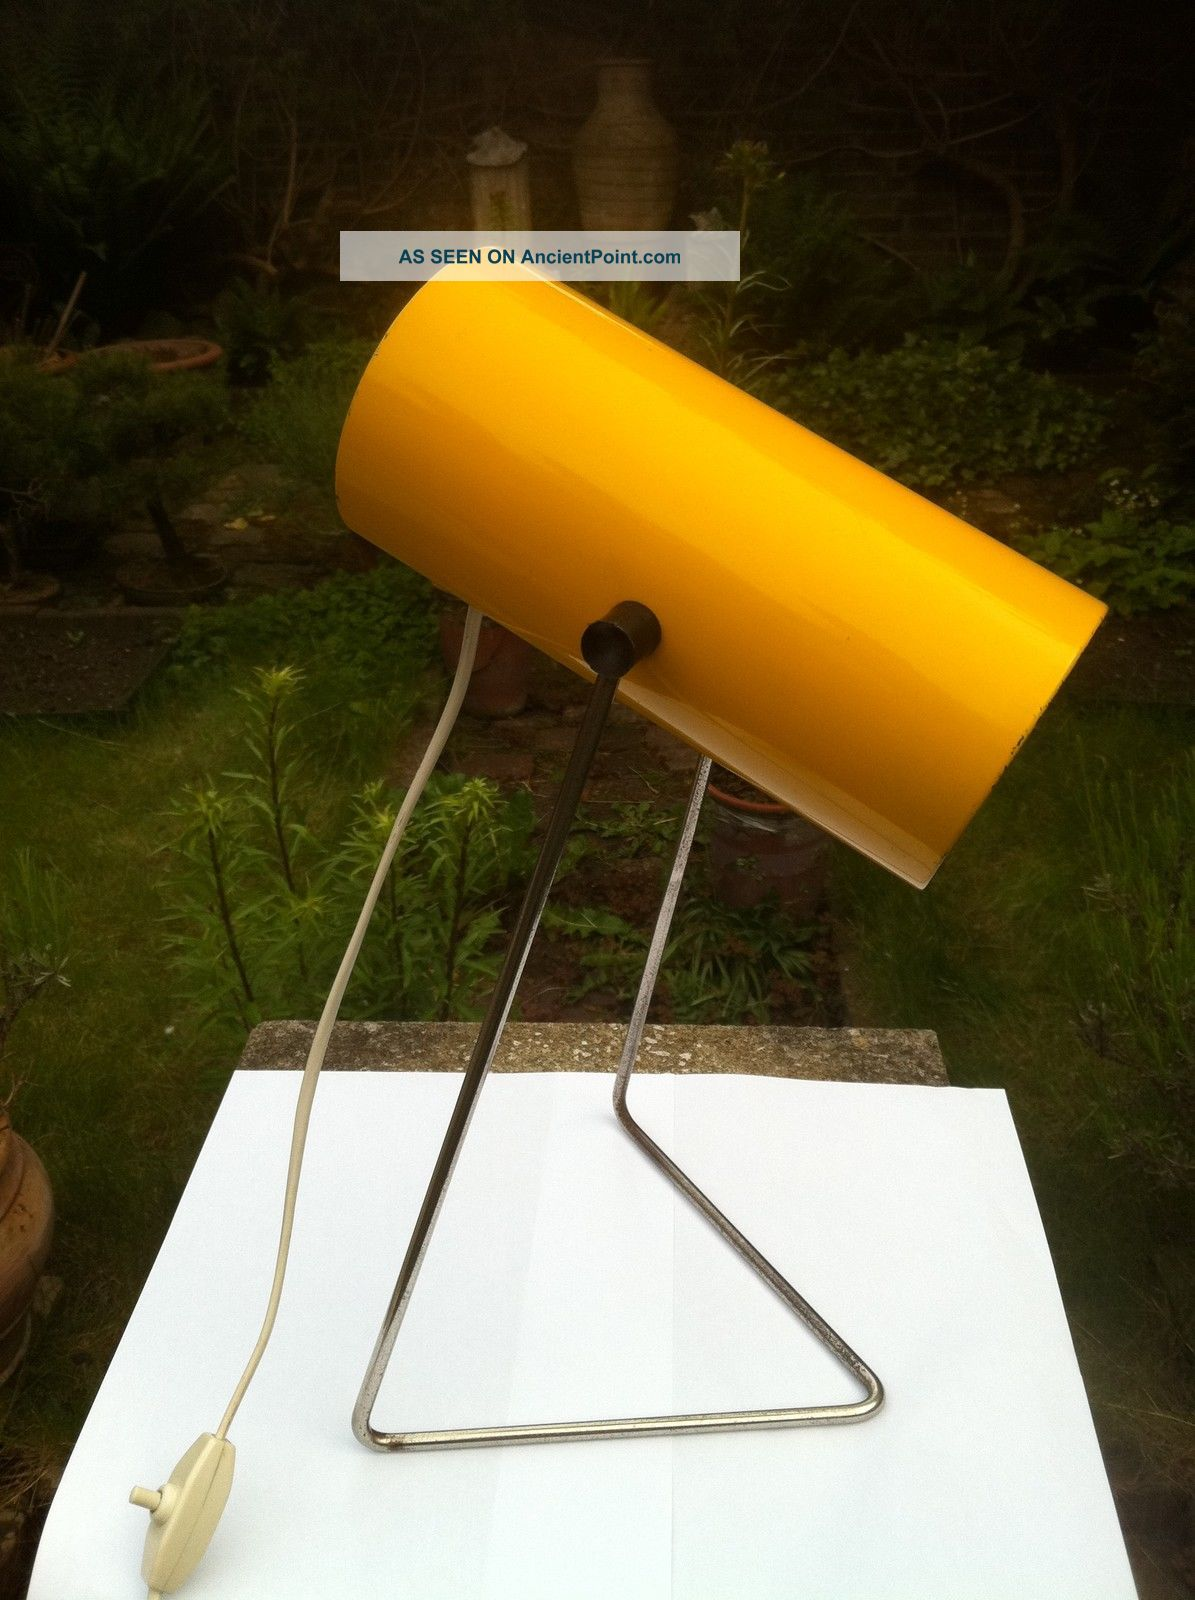 Rare Adjustable Lamp Light John Brown For Plus Lighting Robin Day Race Kalff Era 20th Century photo